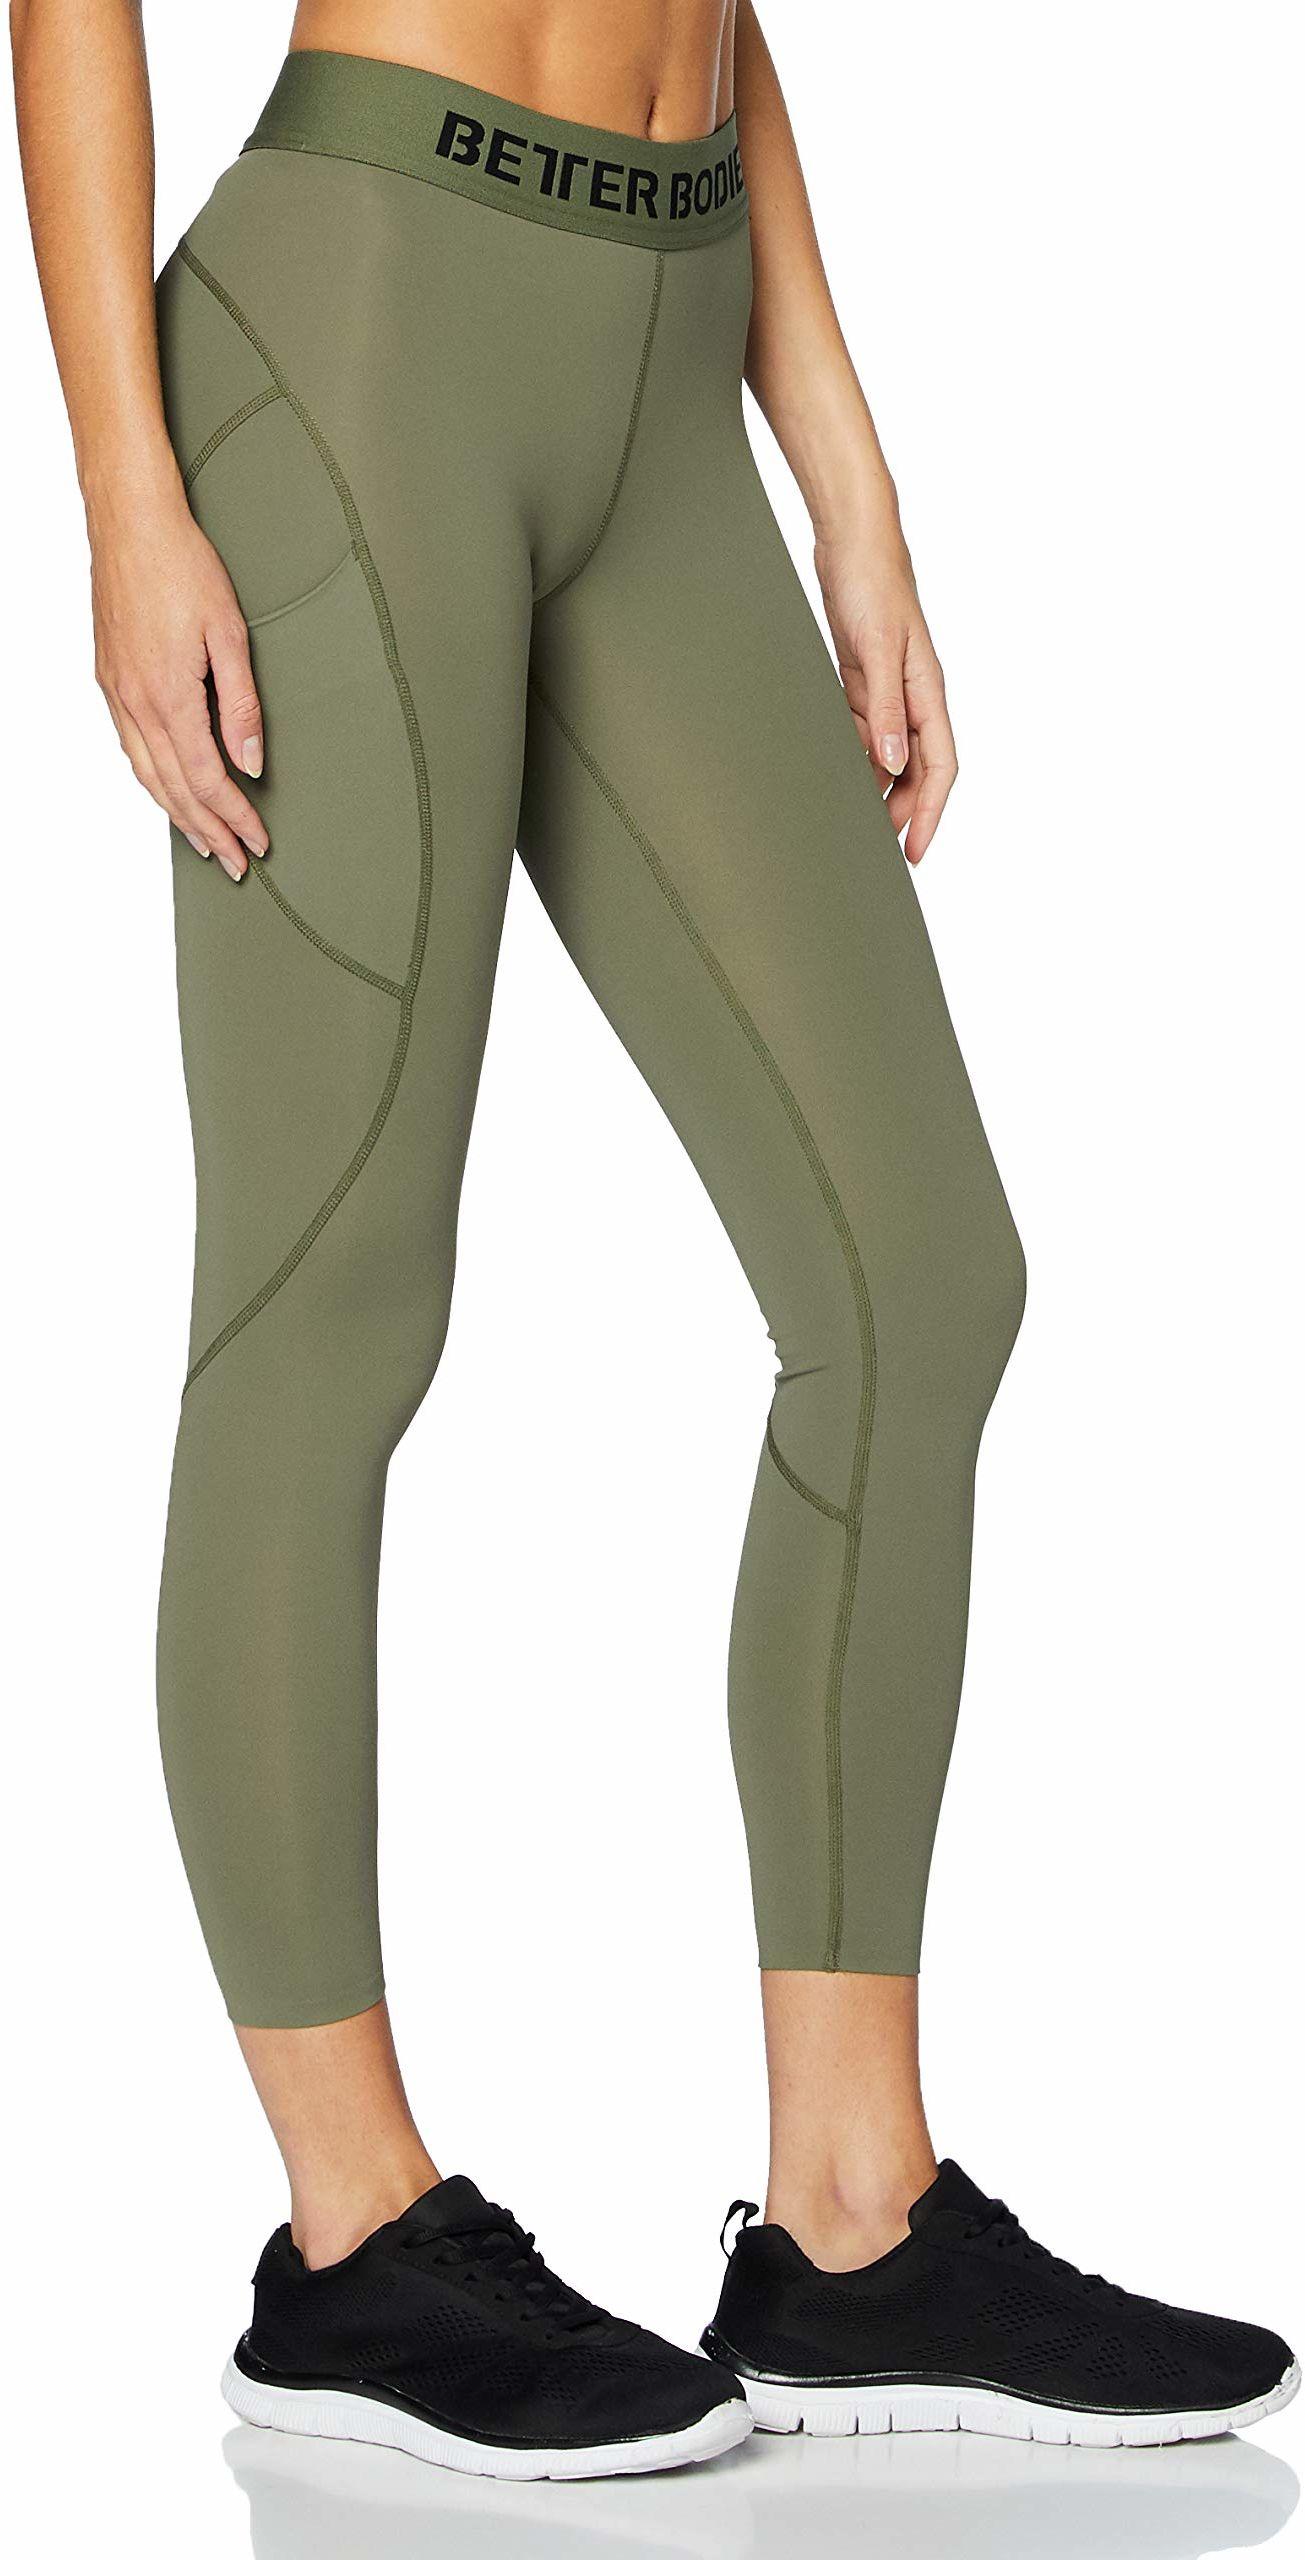 Better Bodies damskie legginsy Highbridge Tights, zielone, L